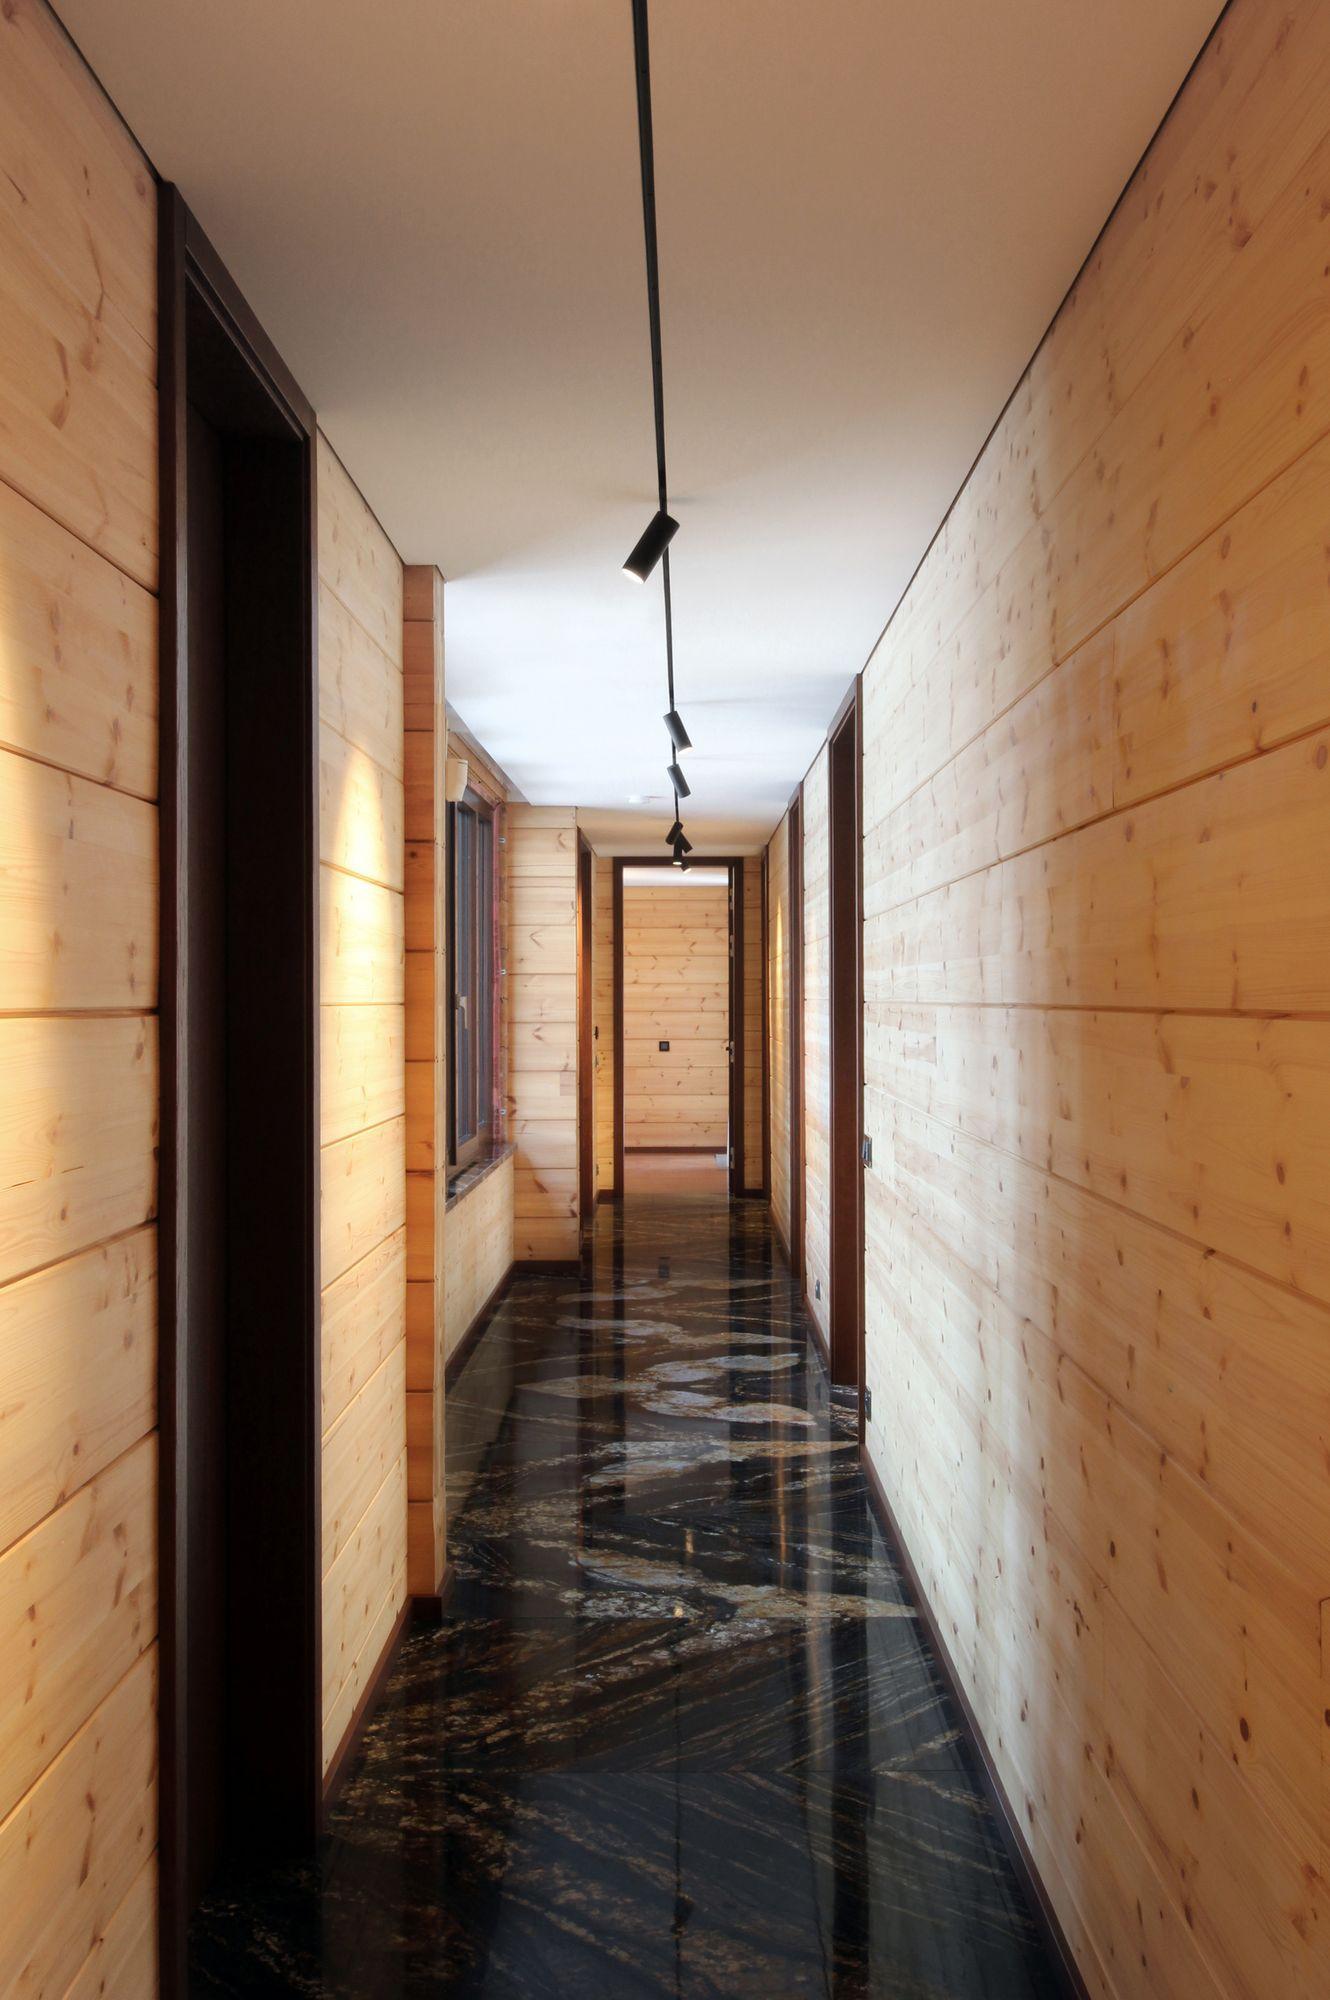 Honka rr modern log house monom interior corridor